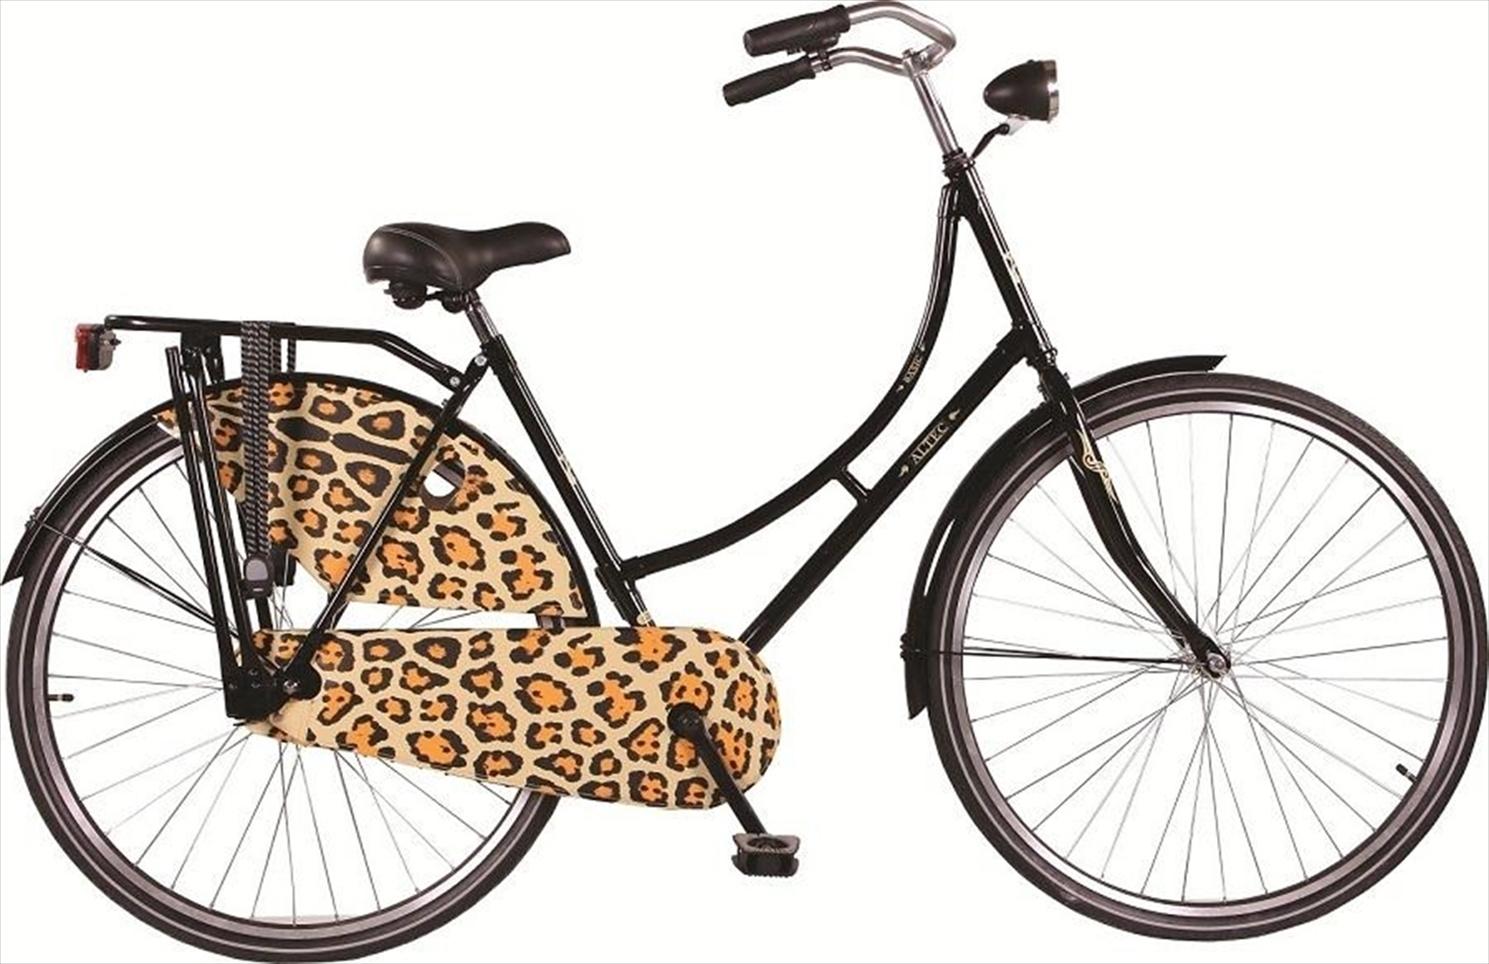 28 zoll hollandrad basic schwarz leopard d fahrrad ass. Black Bedroom Furniture Sets. Home Design Ideas